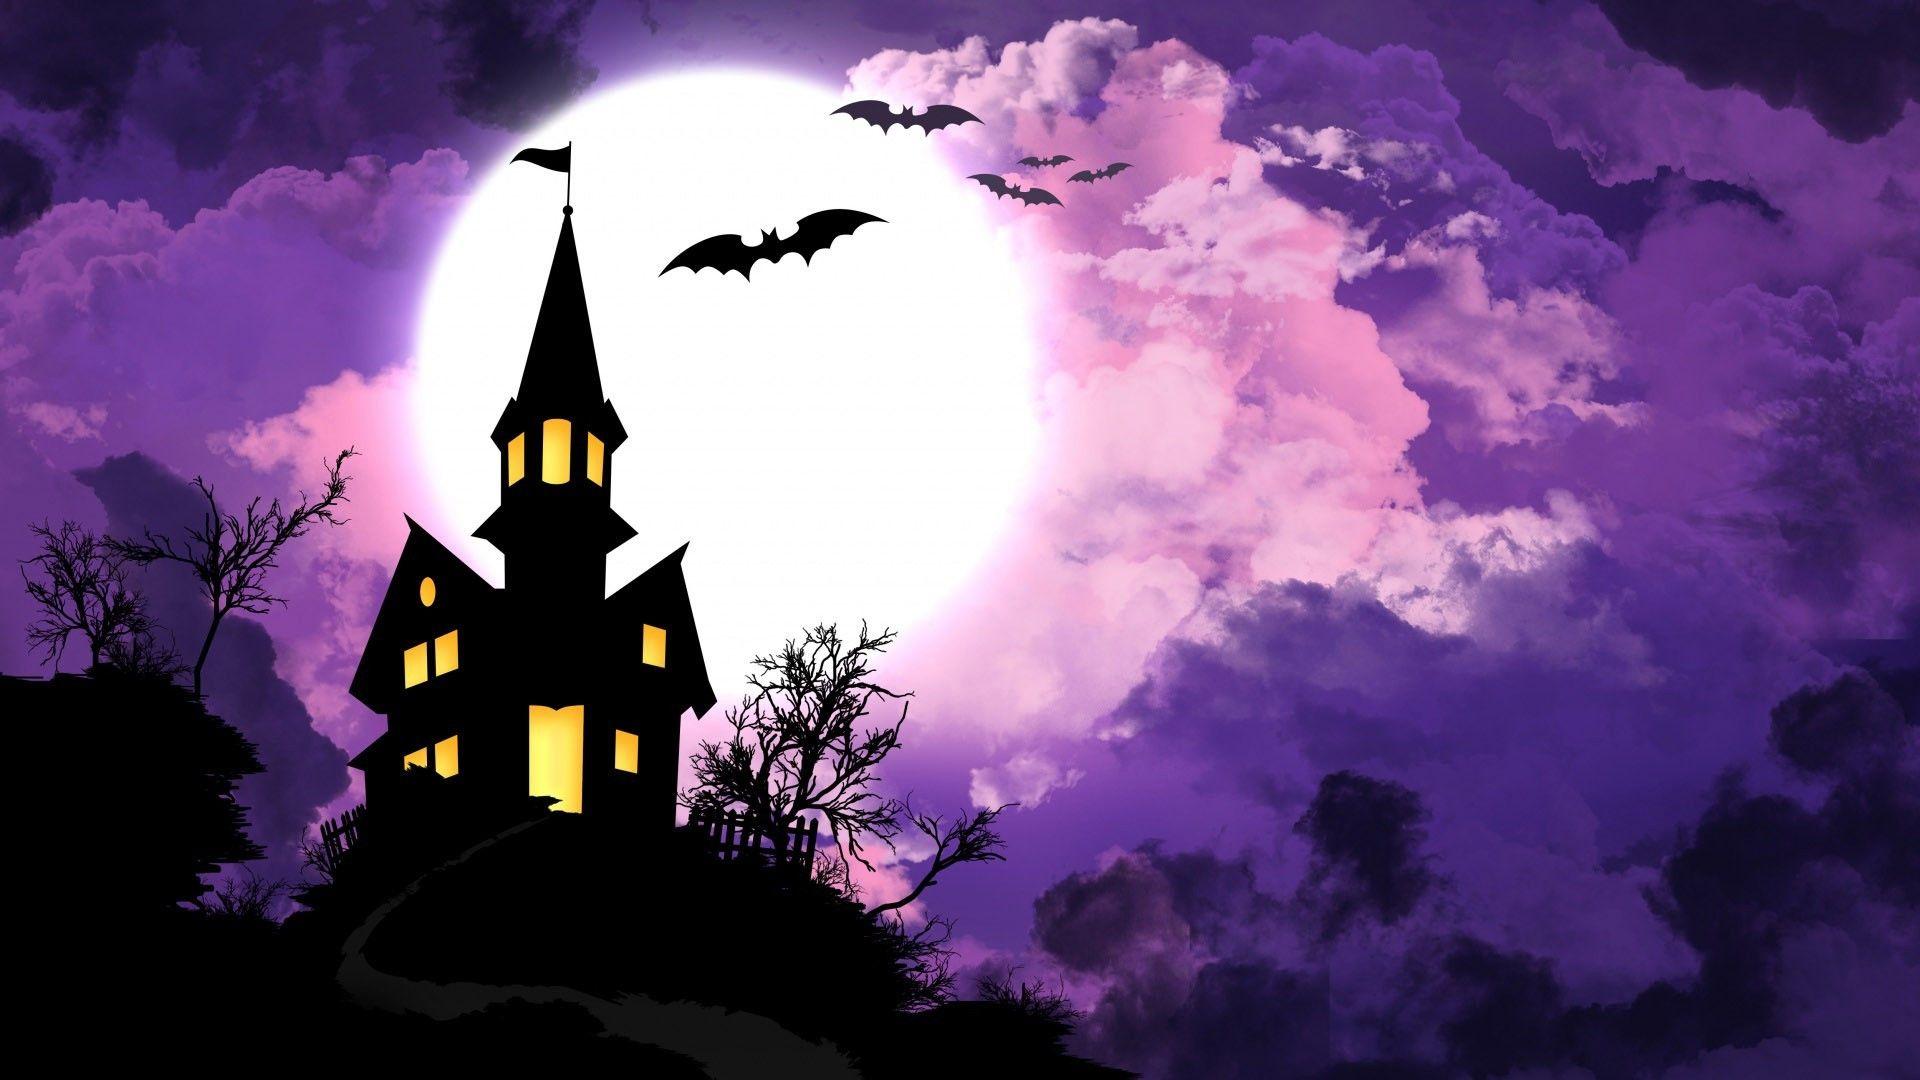 Pictures images halloween backgrounds wallpapers Halloween